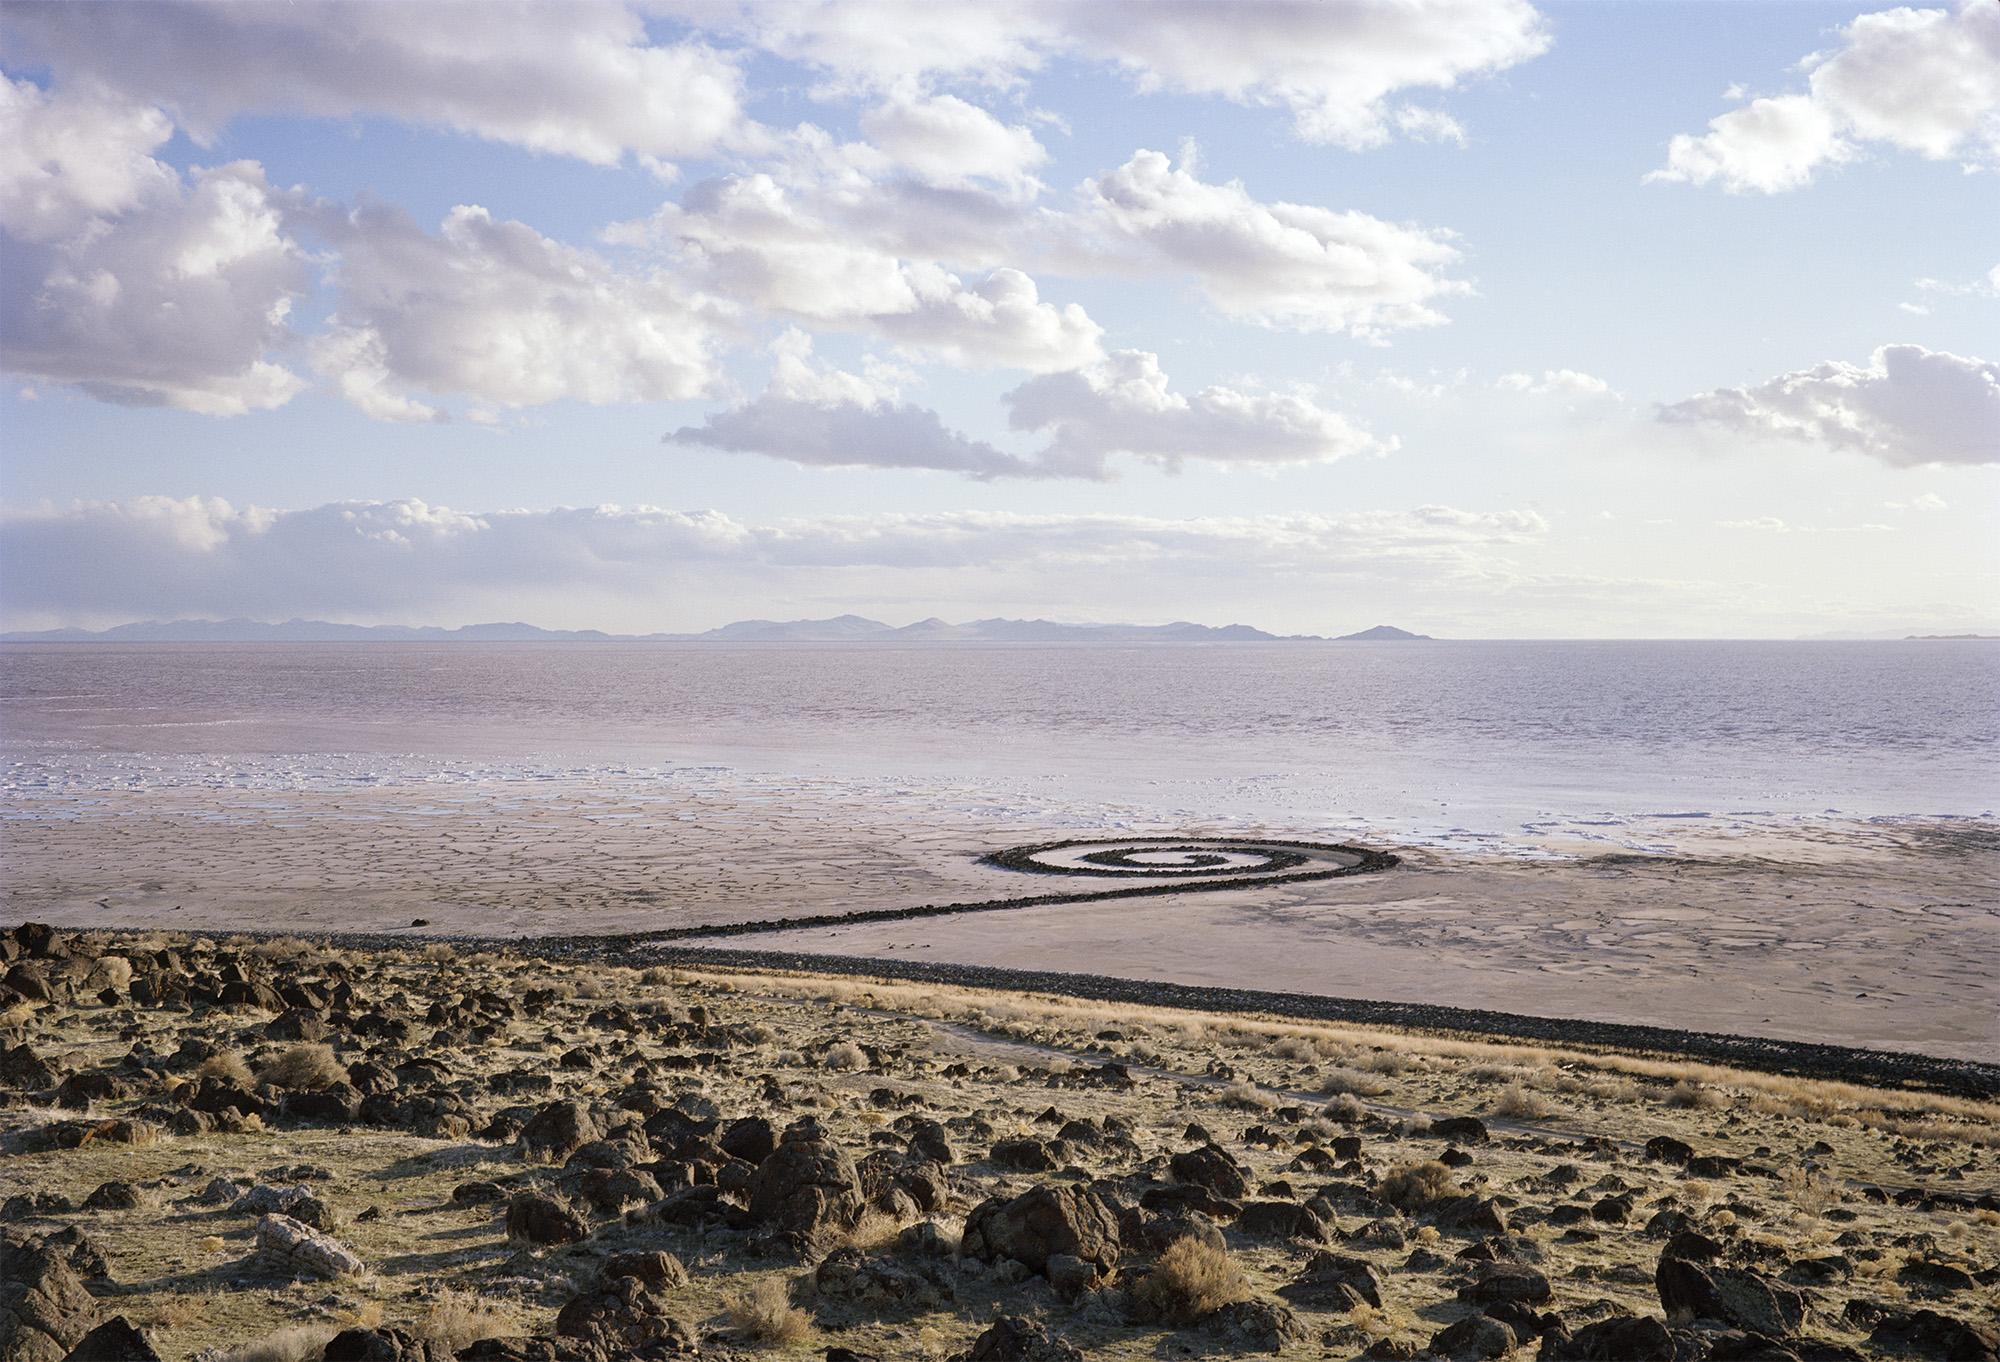 Robert Smithson's Spiral Jetty, Rozel Point, UT.